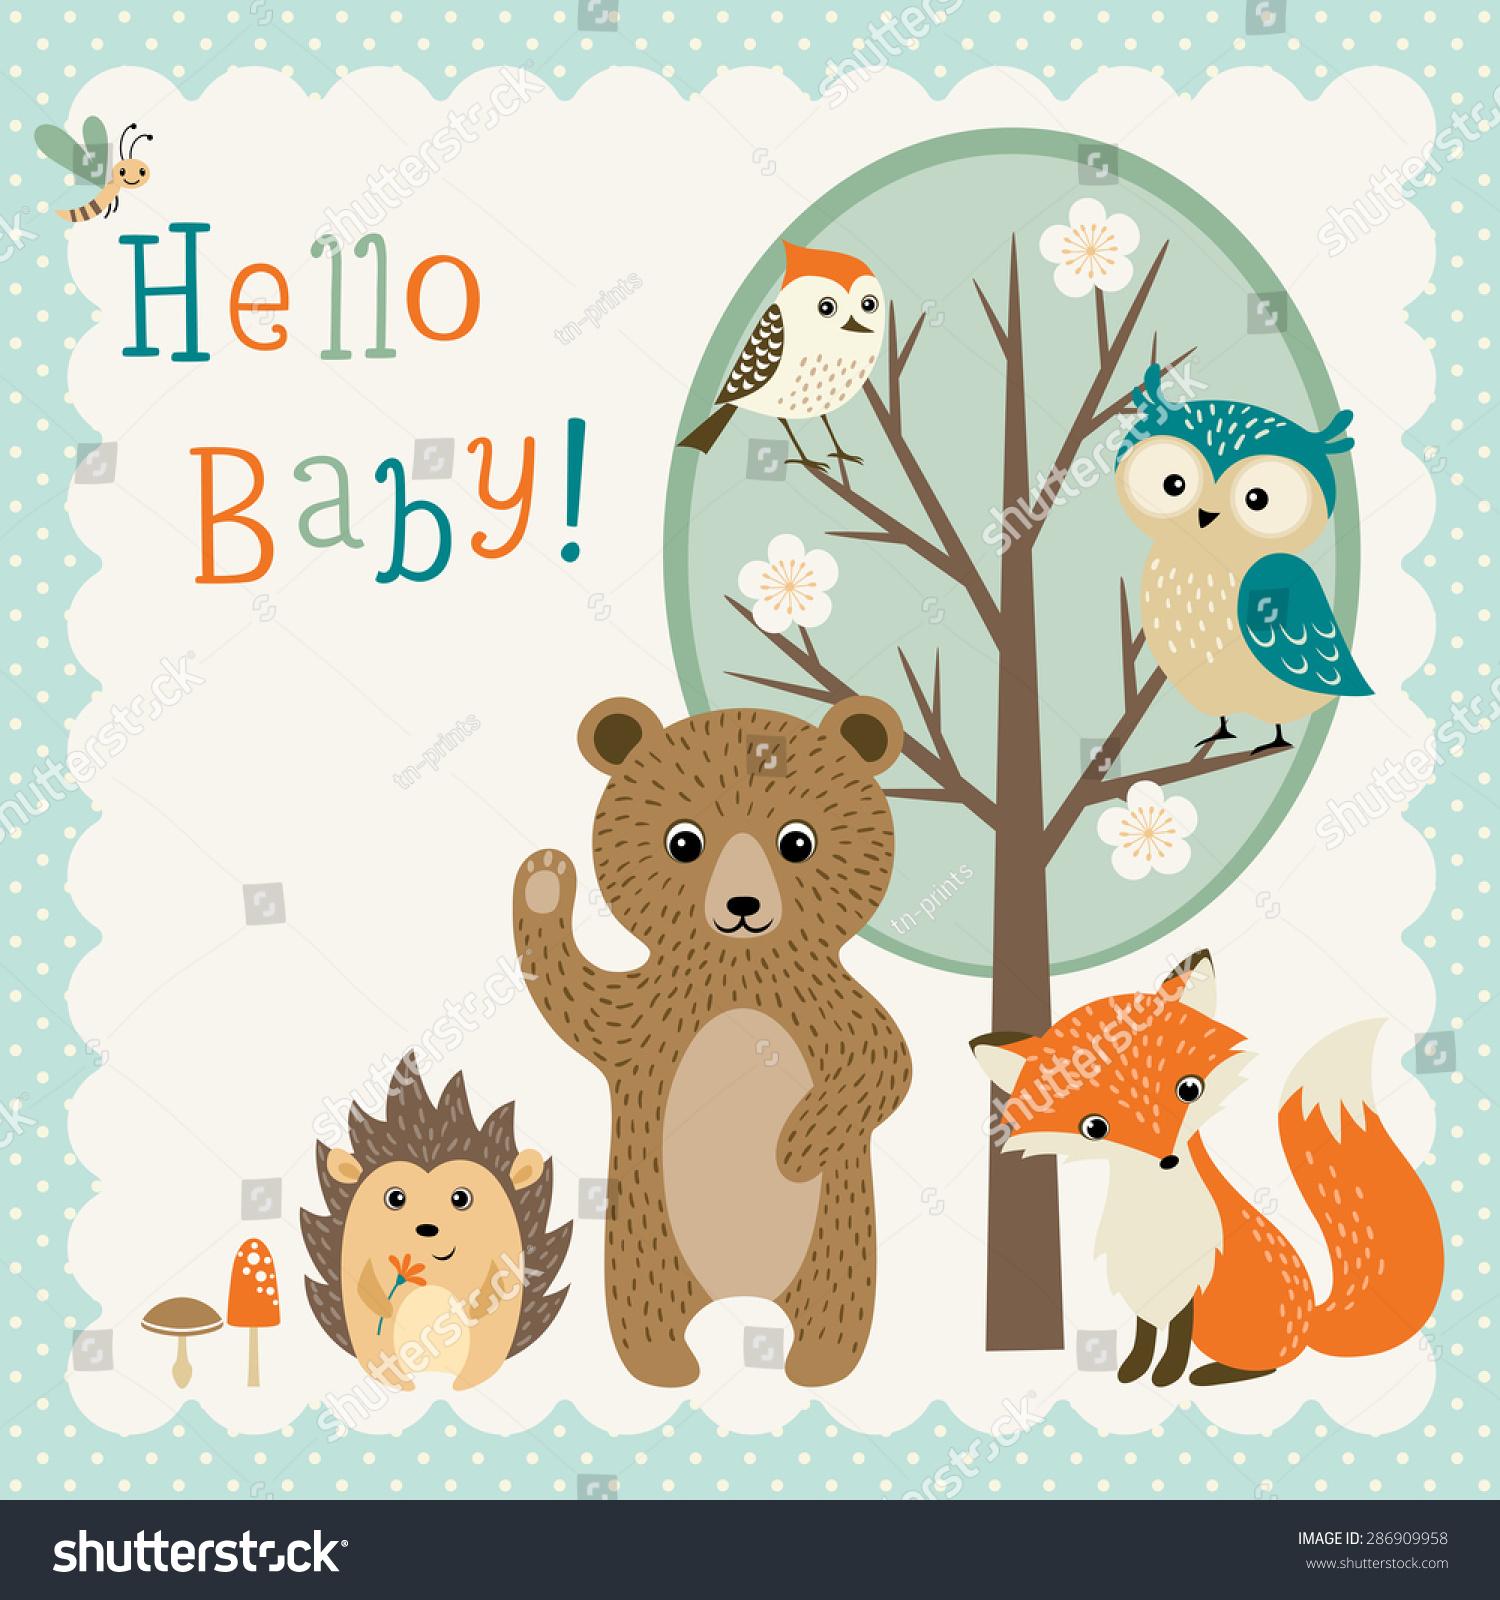 Baby Shower Design Cute Woodland Animals Stock Vector